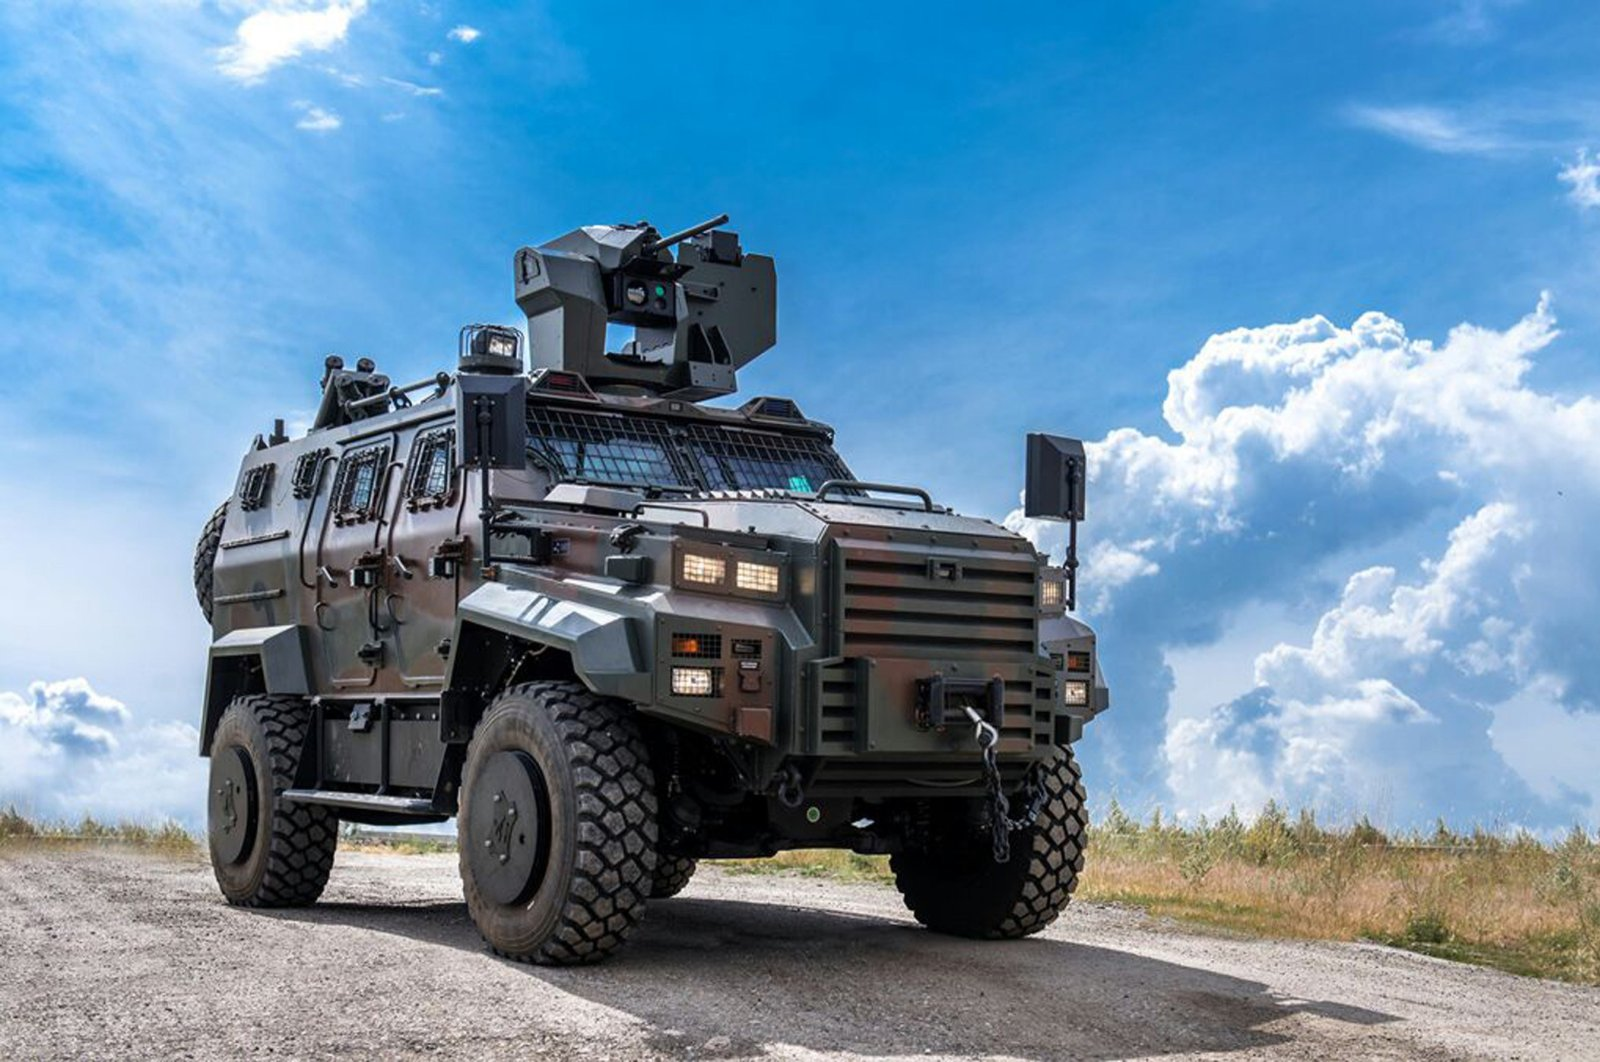 Nurol Makina's Ejder Yalçın armored vehicle, March 31, 2017. (Courtesy of Nurol Makina)